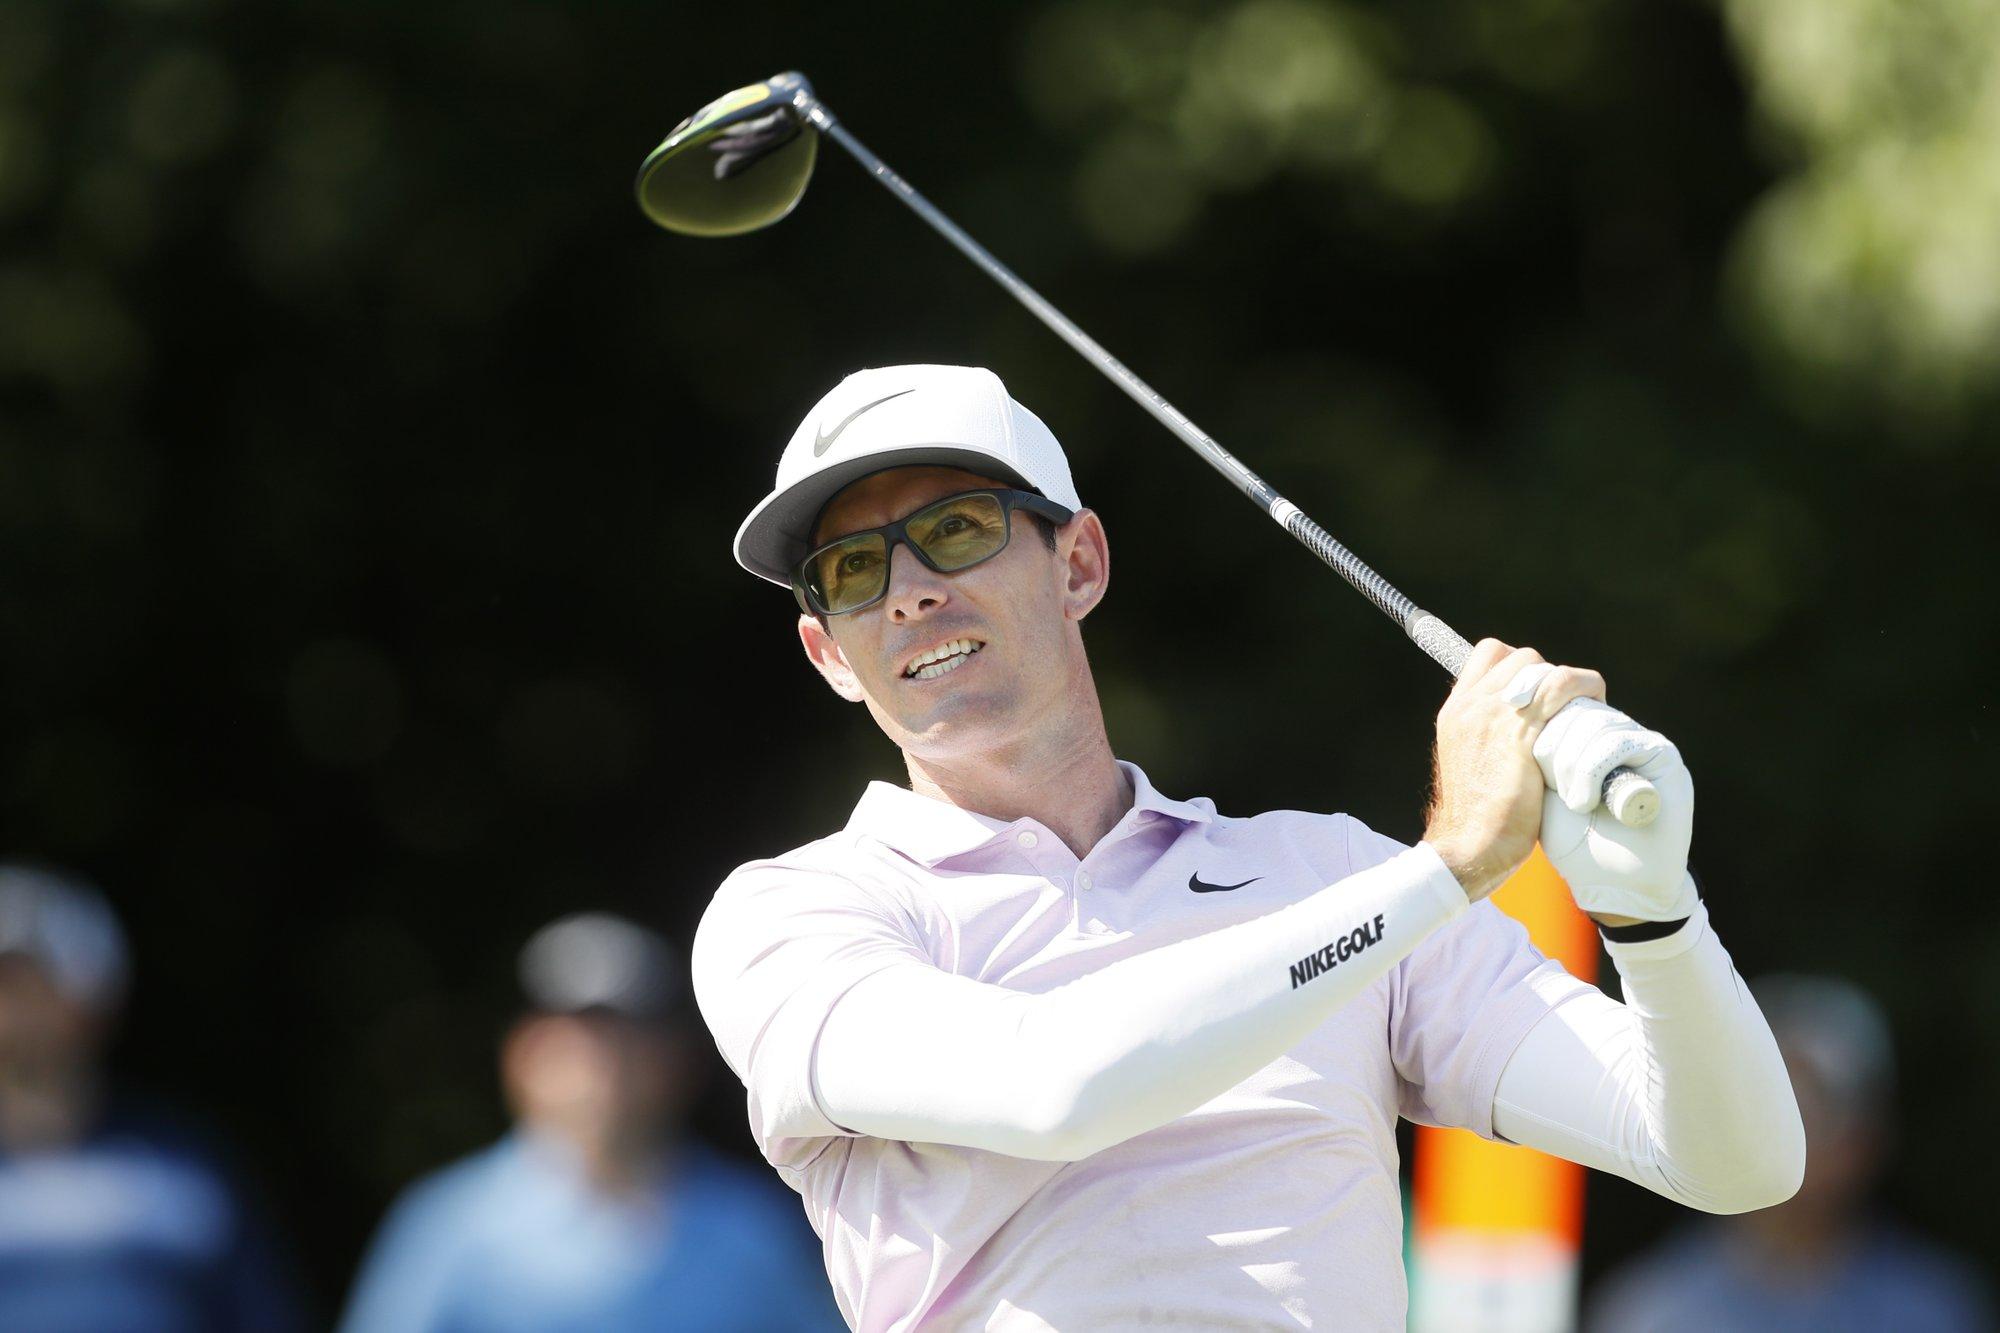 Frittelli wins John Deere for first PGA Tour title